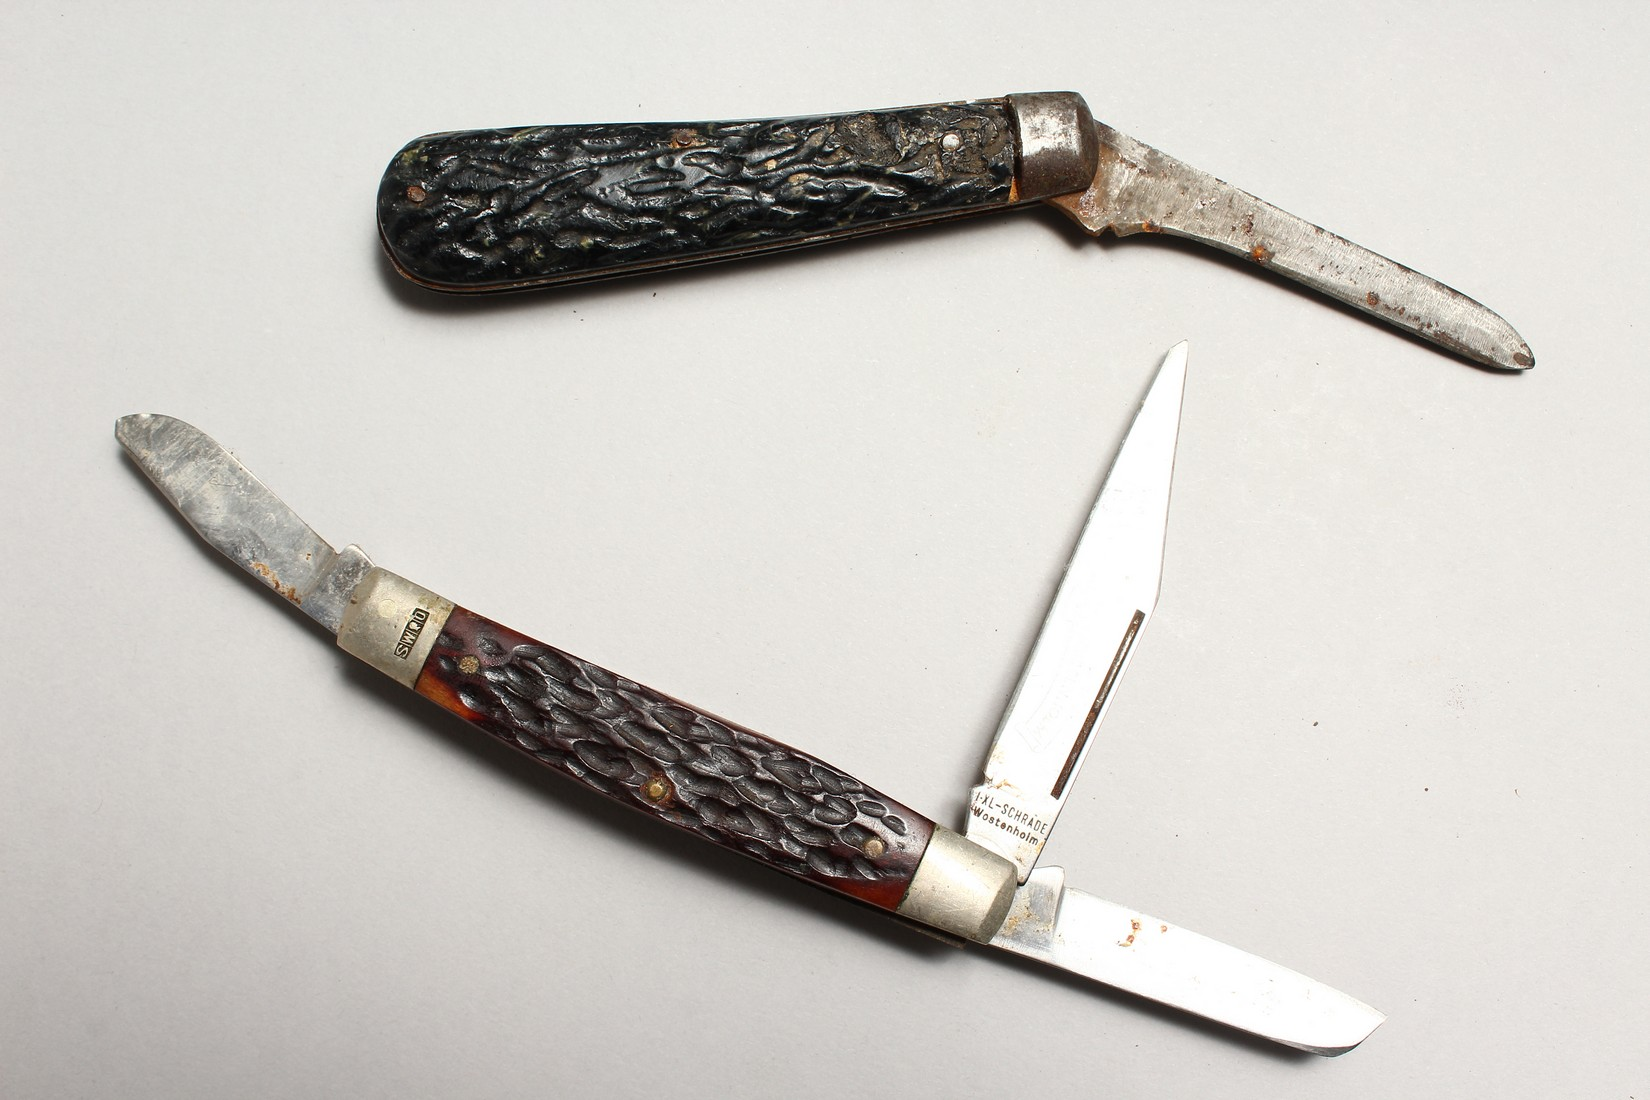 TWO SHEFFIELD WOSTERHOLM PEN KNIVES - Image 3 of 5